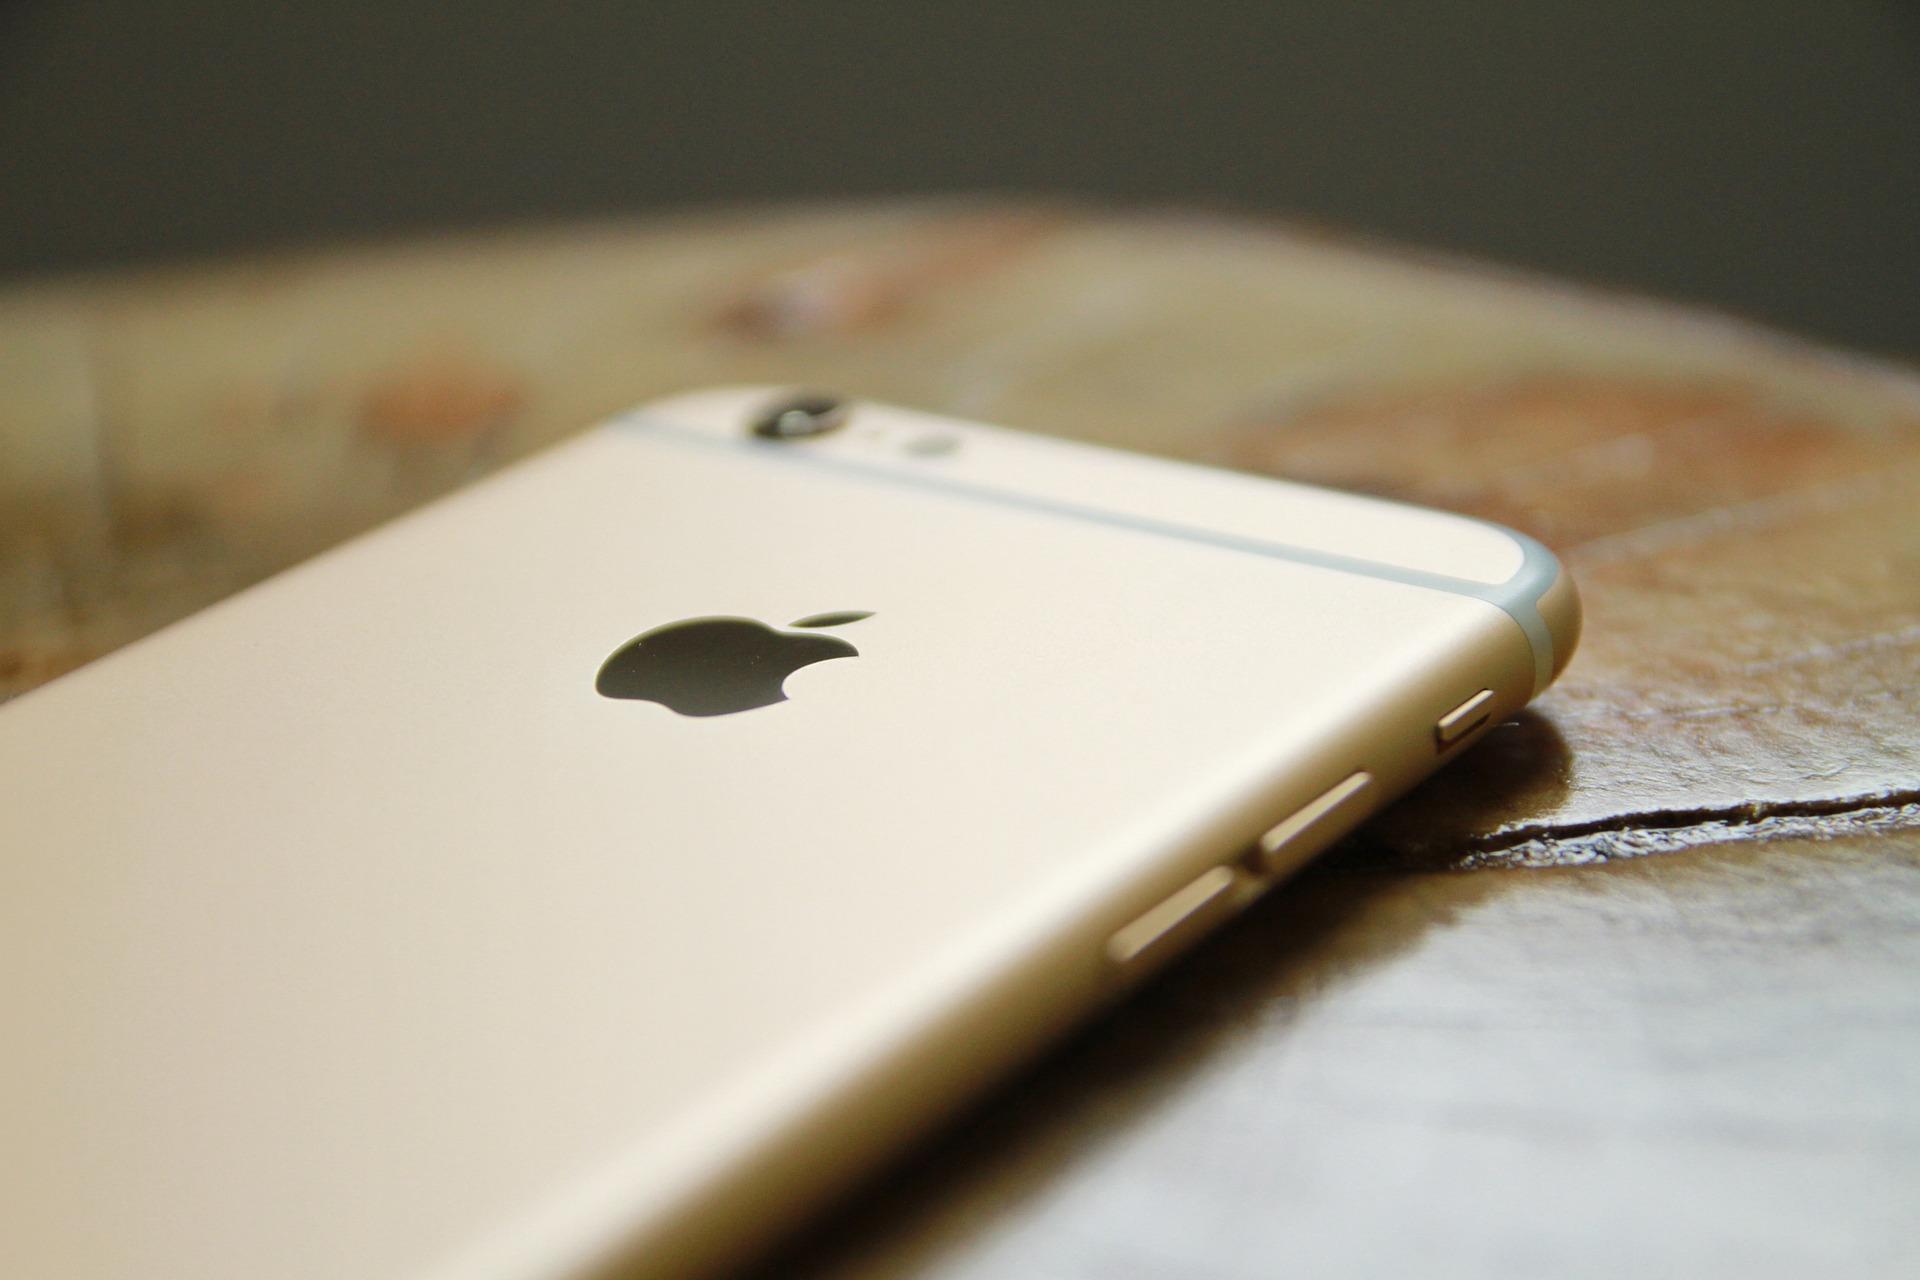 cell-phone-1149684_1920.jpg